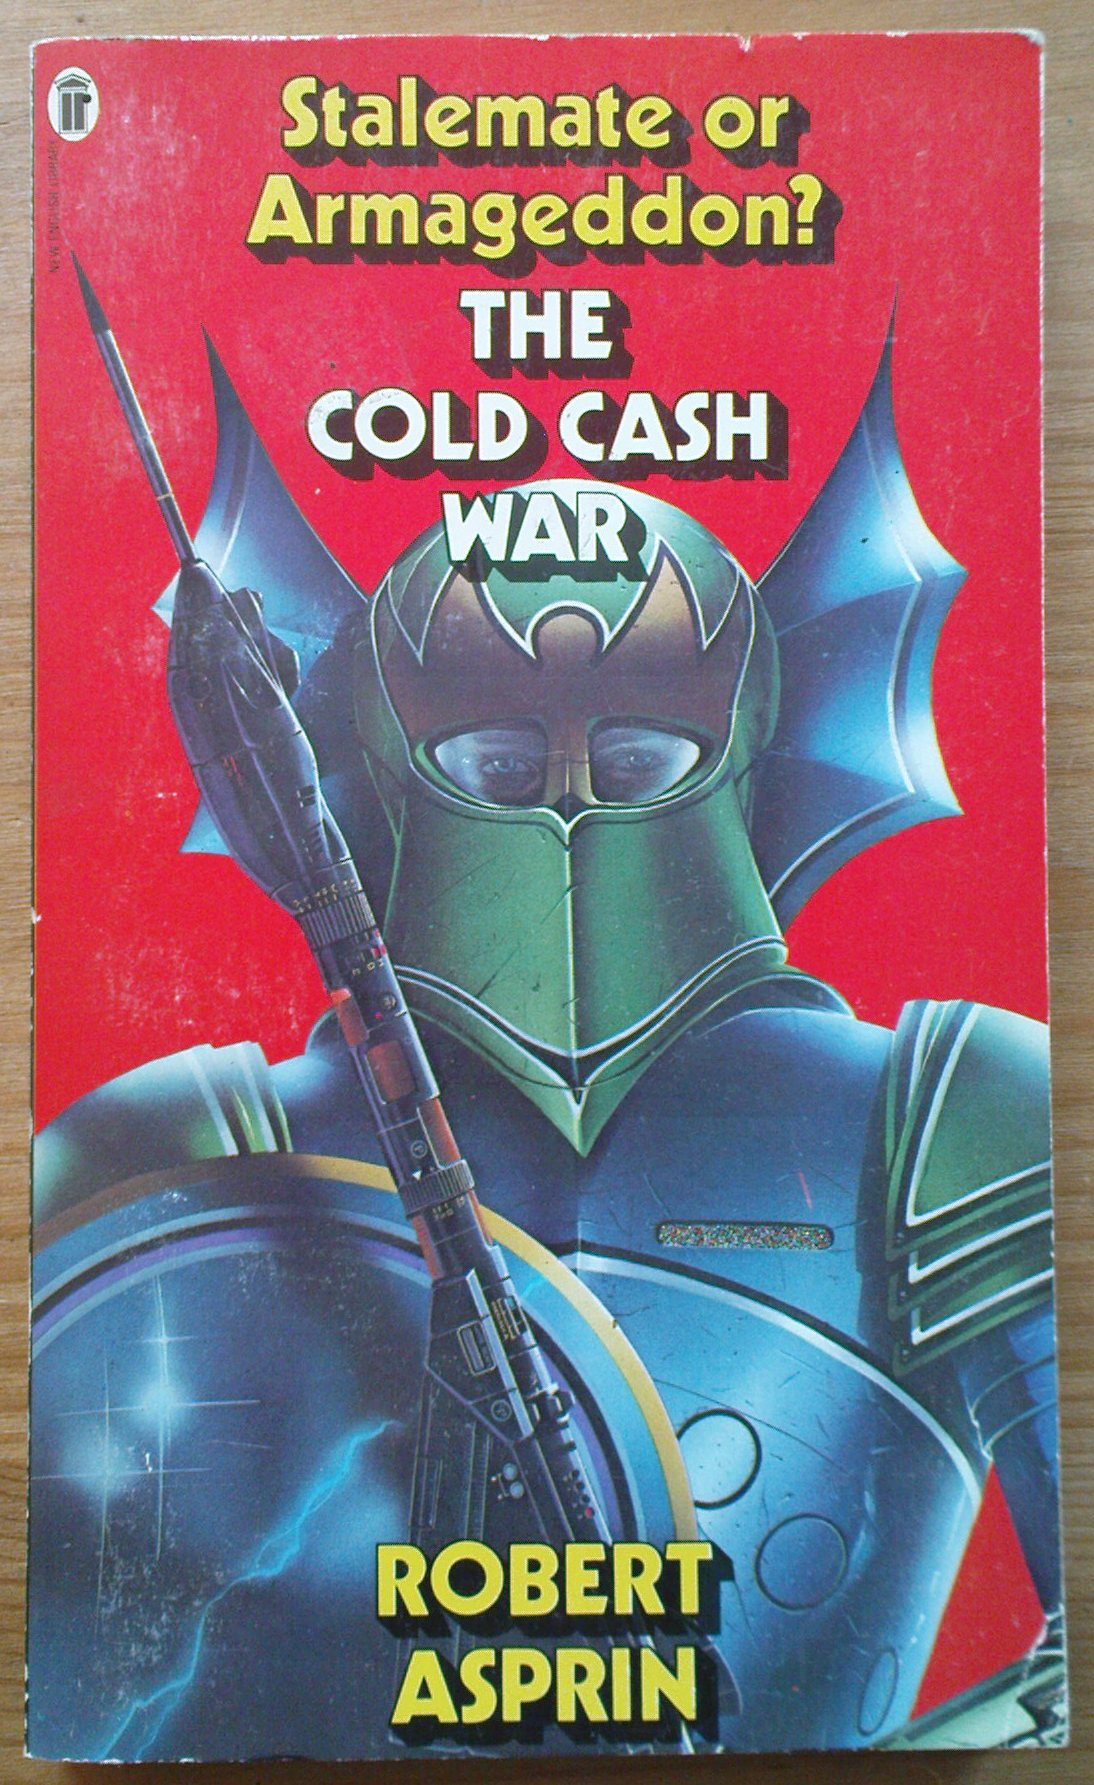 The Cold Cash War